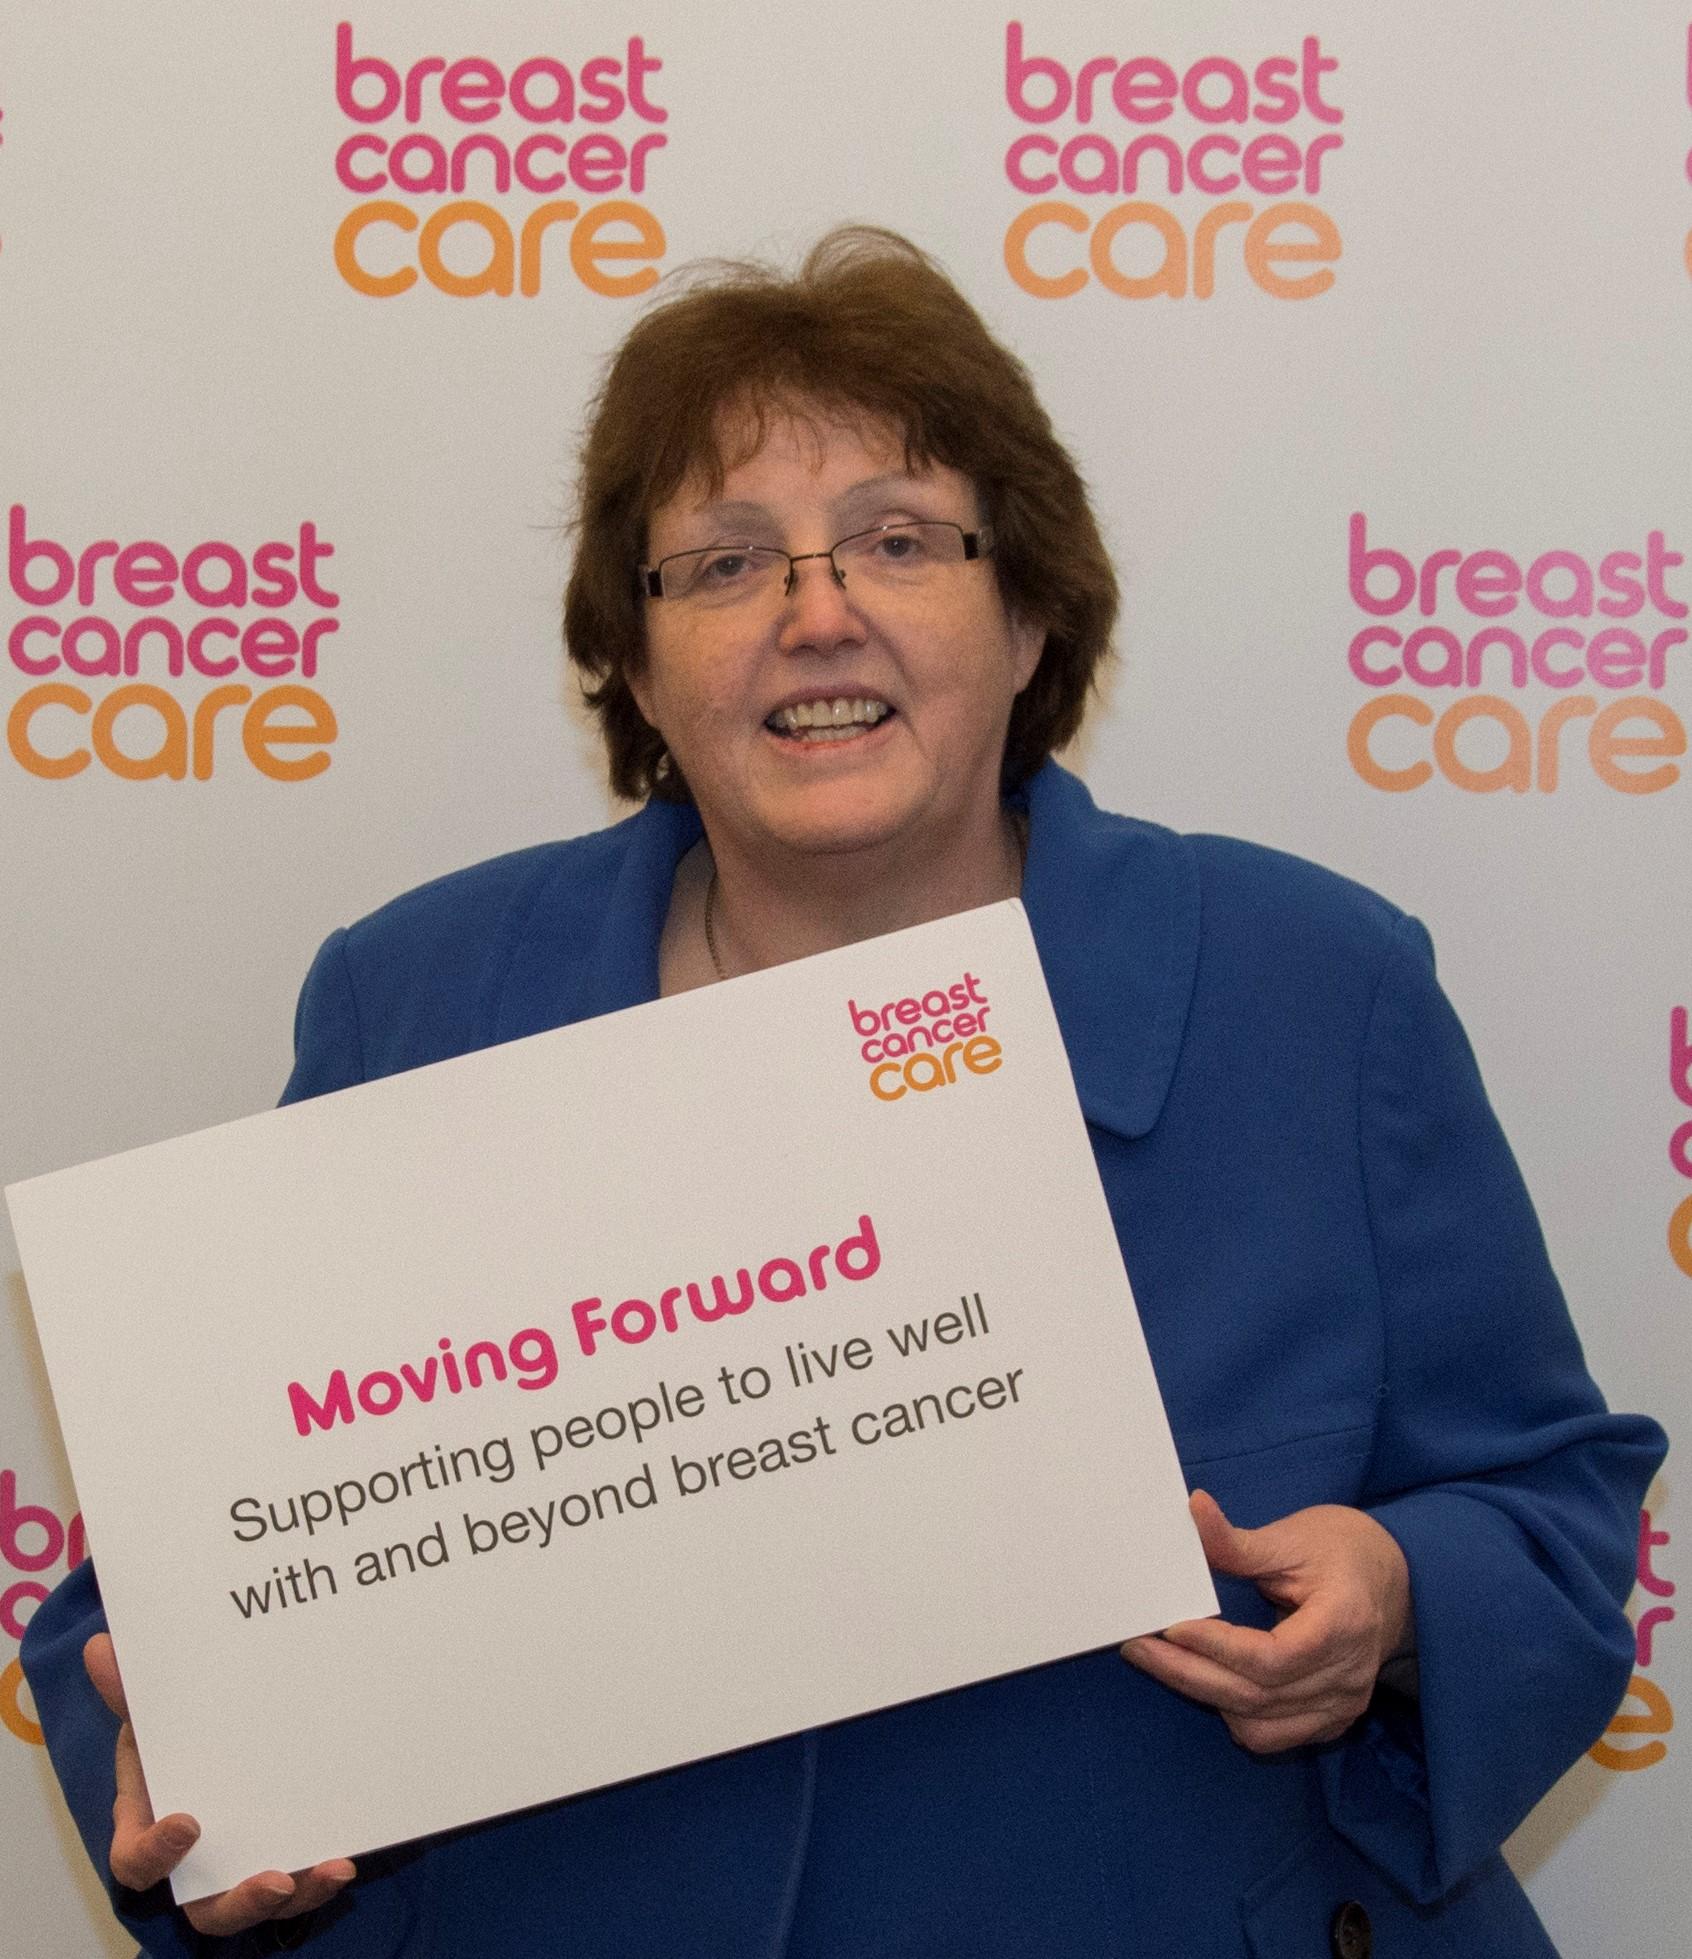 Rosie_Cooper_MP_Breast_Cancer_Care.jpg